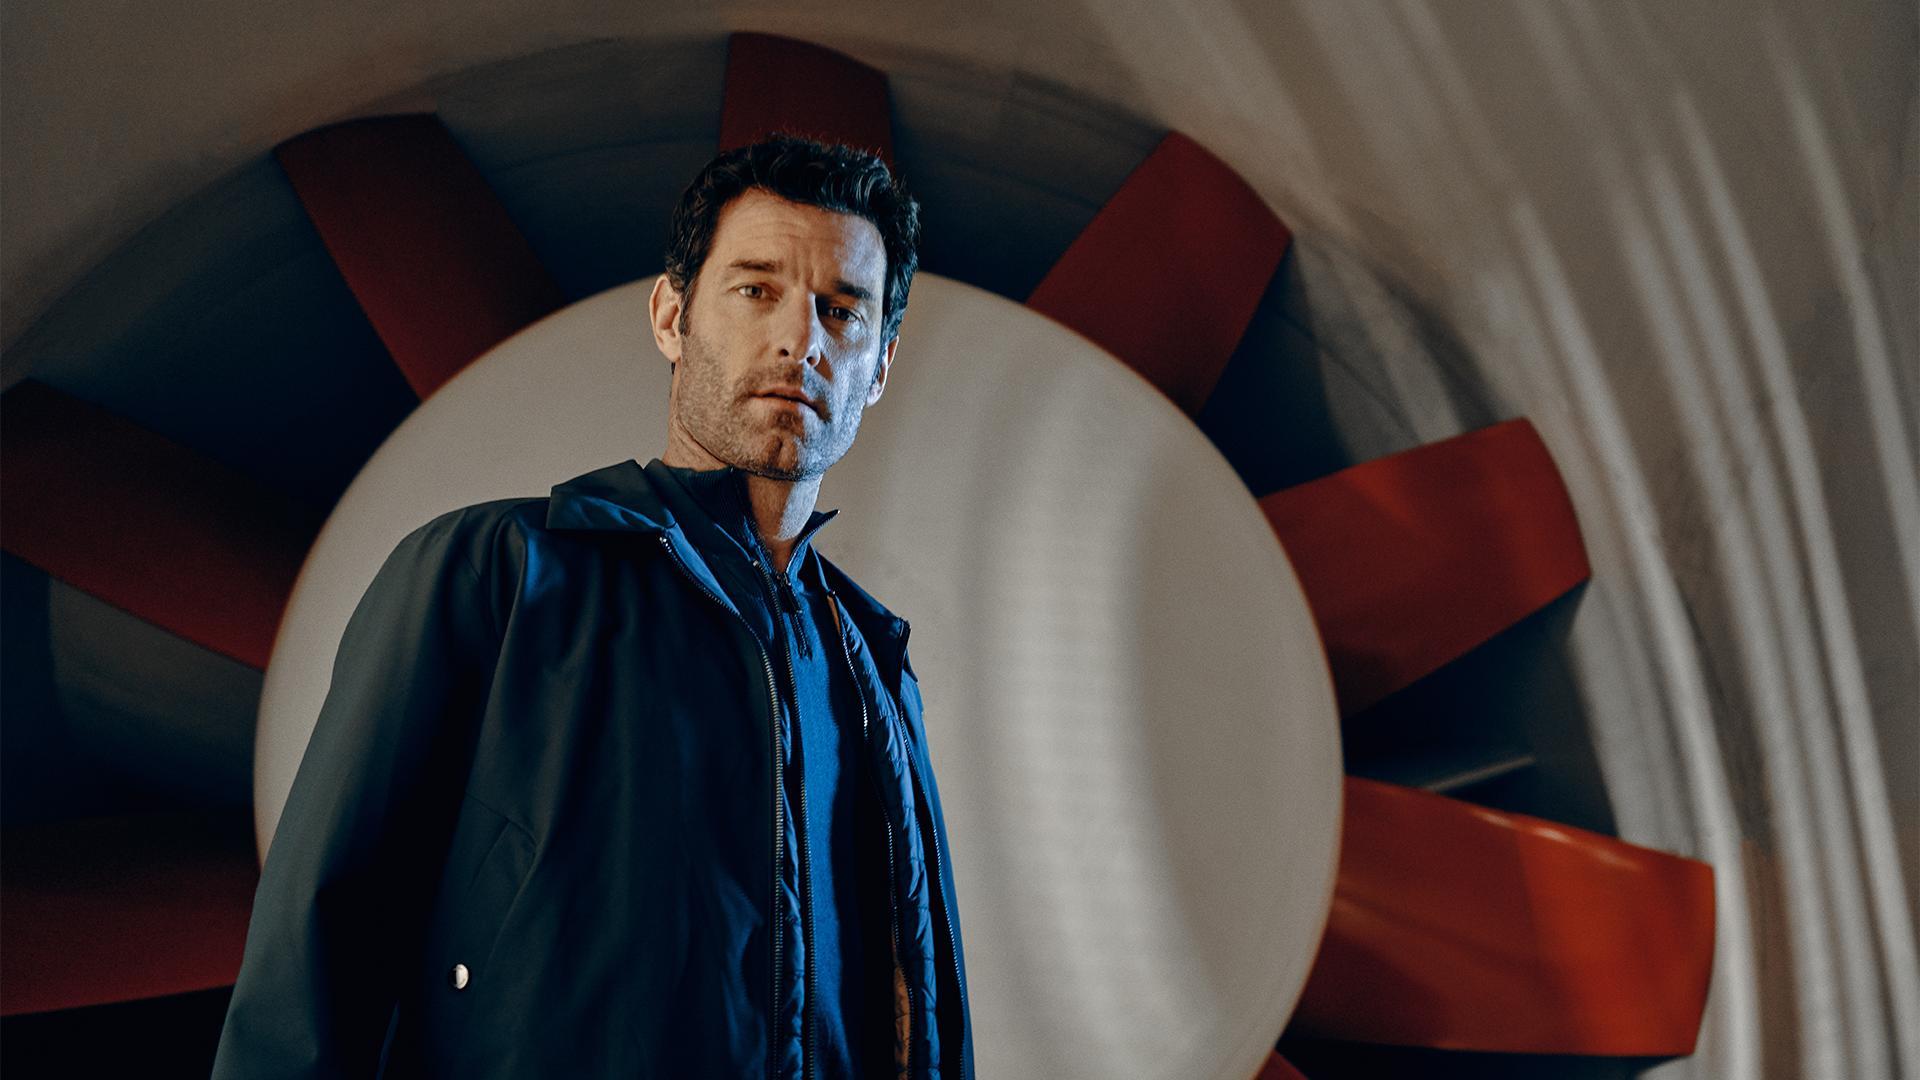 Mark Webber BOSS x Porsche capsule collection 2020